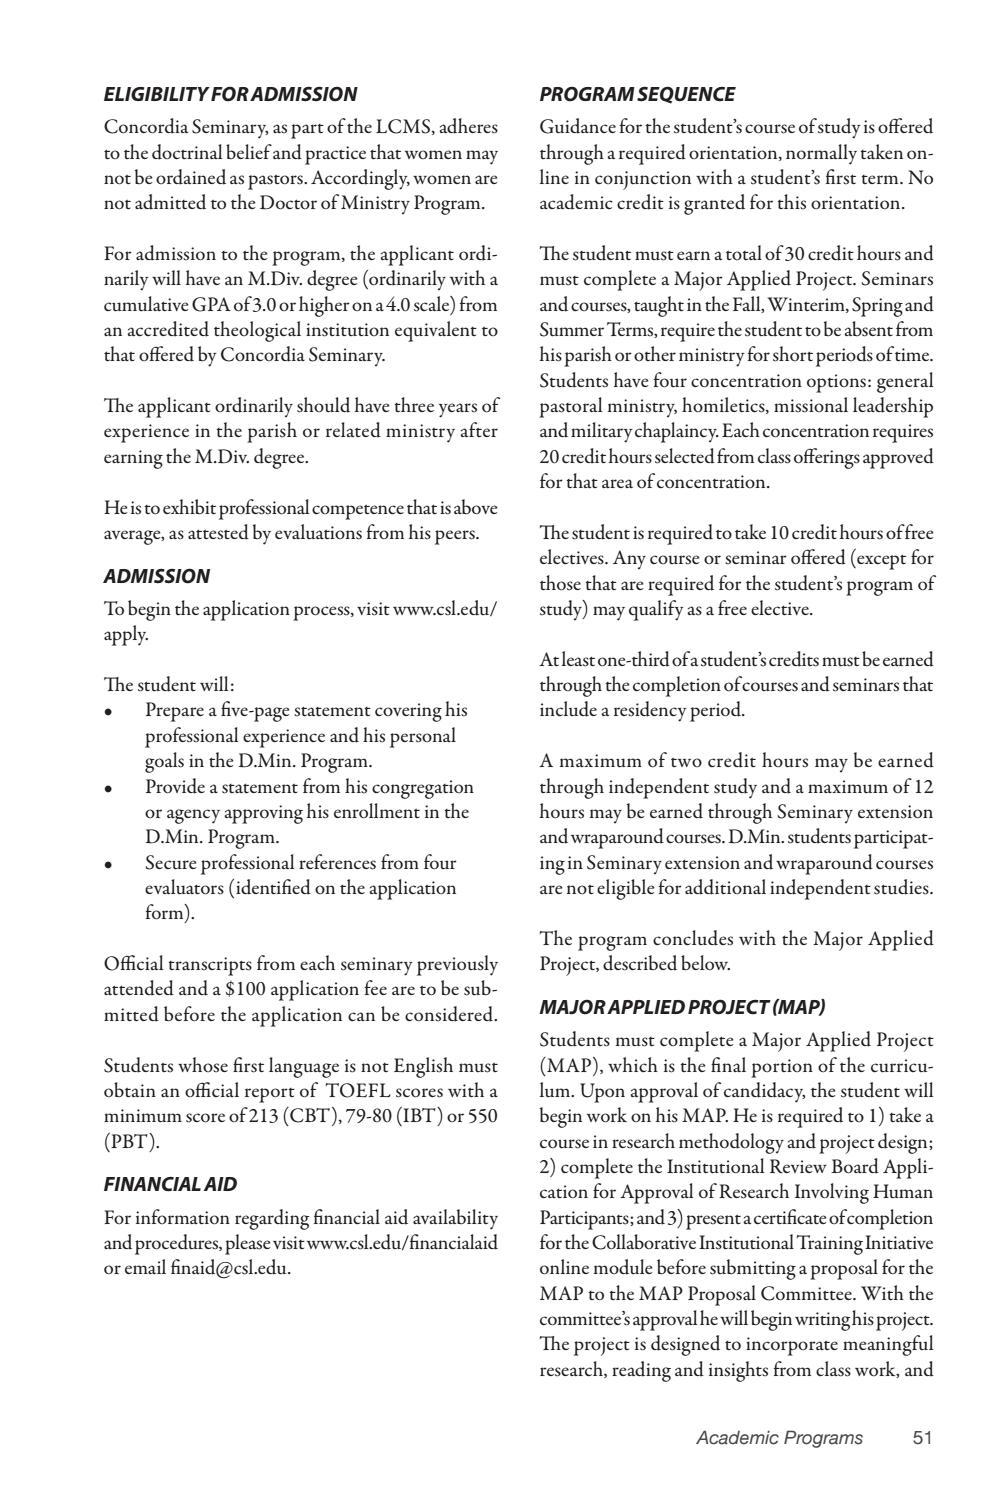 Academic Catalog 2017-18 by Concordia Seminary - issuu